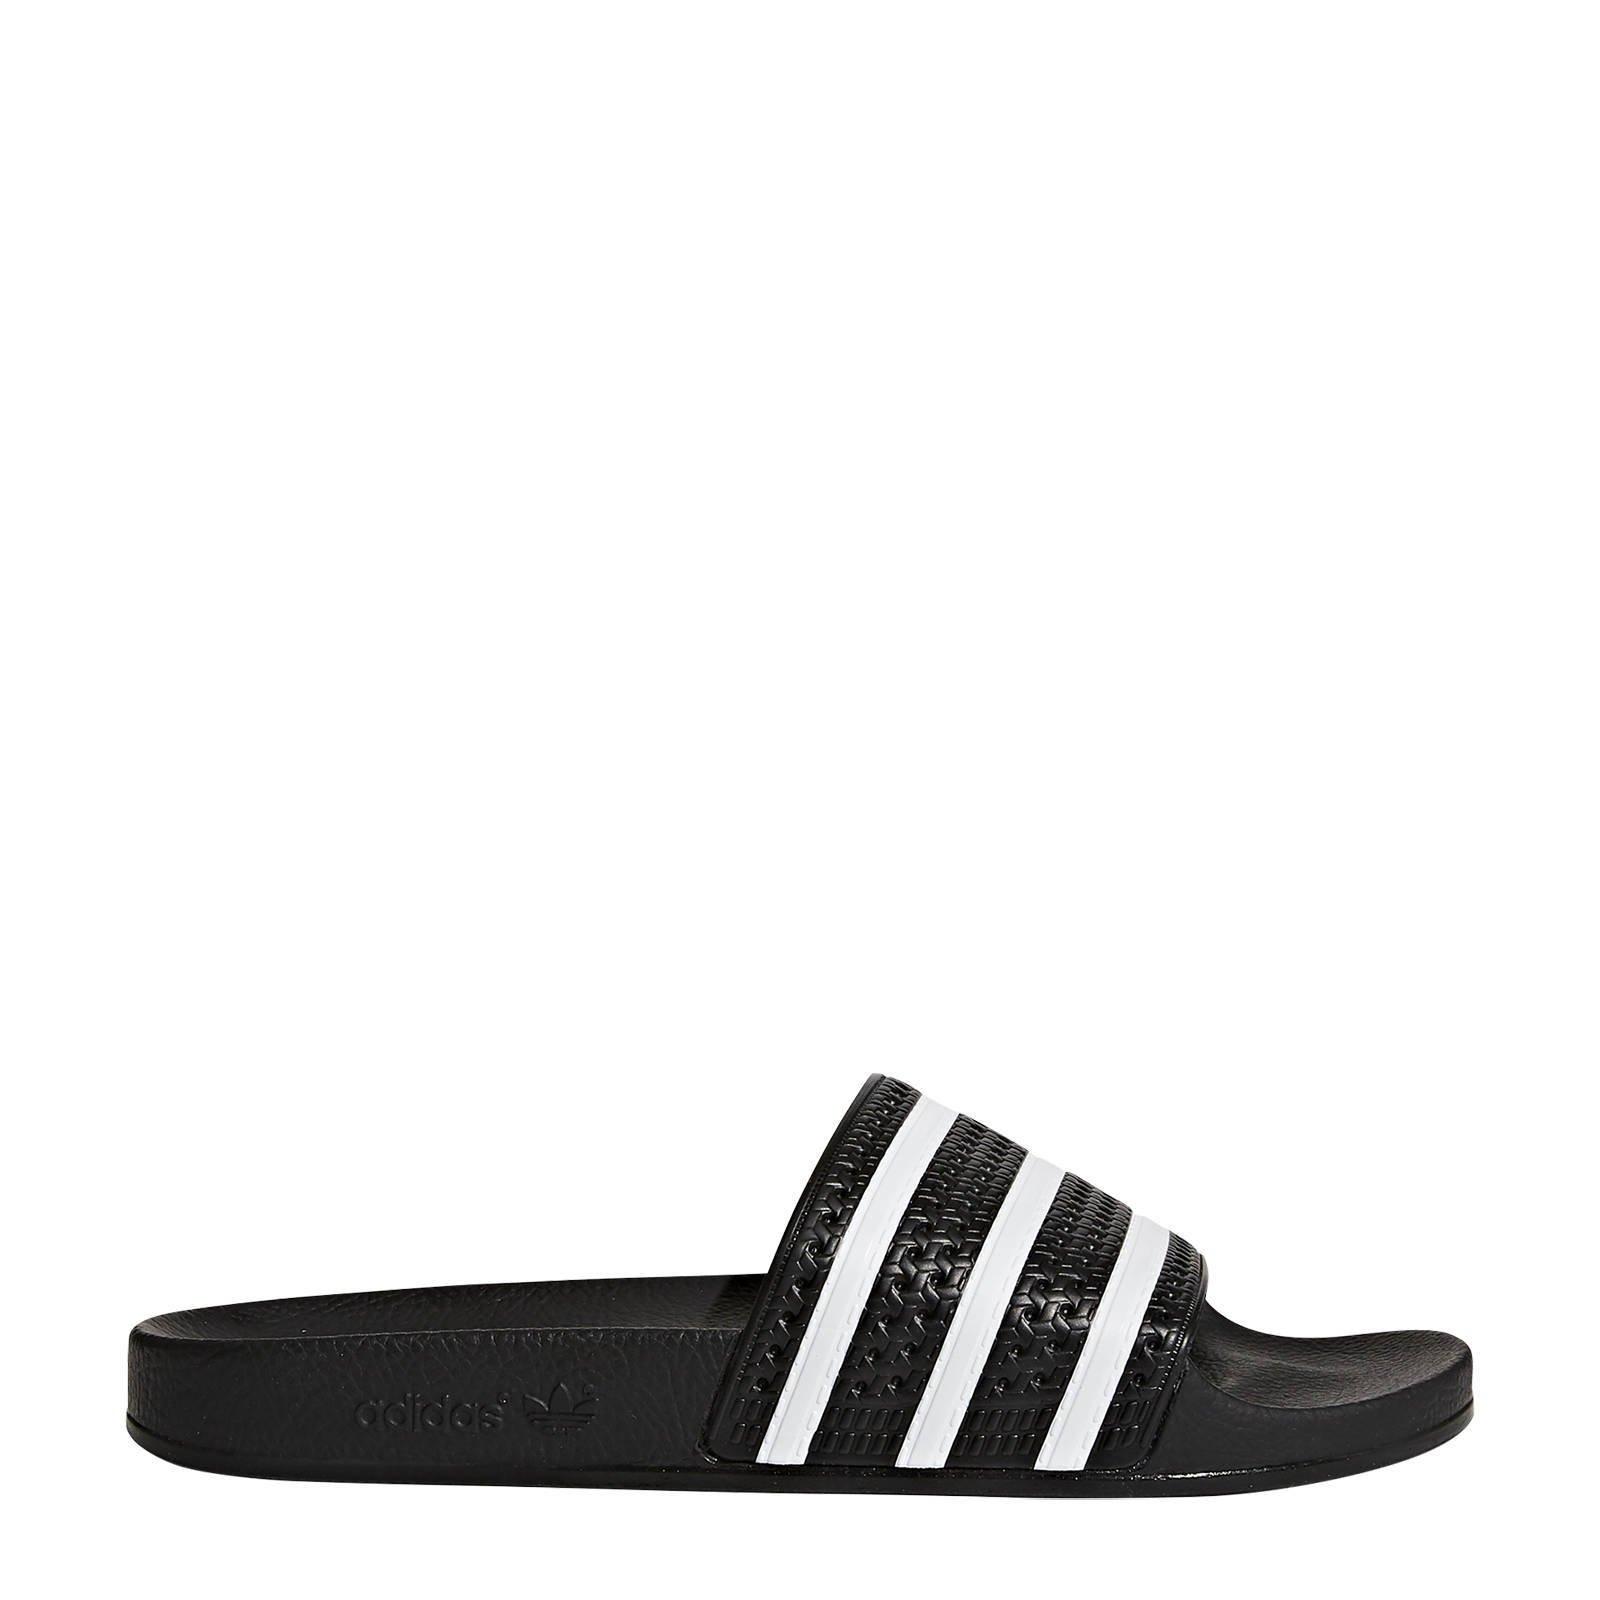 adidas Originals Adilette badslippers zwart/wit | wehkamp